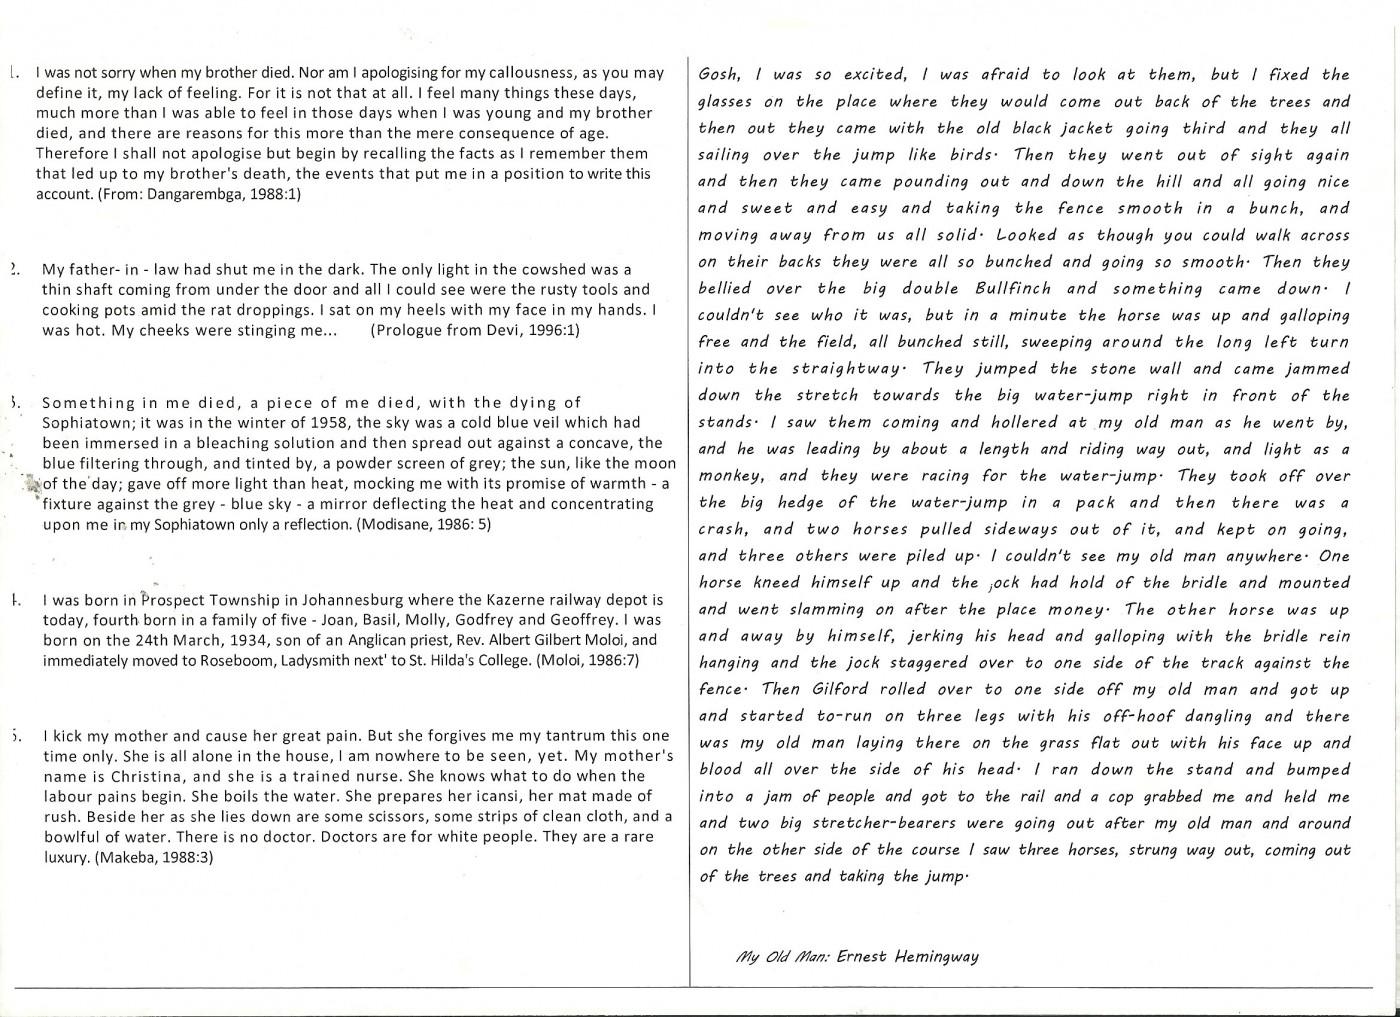 013 Essay Example Paragraph College Good Vs Excellent 5 Pdf 1400